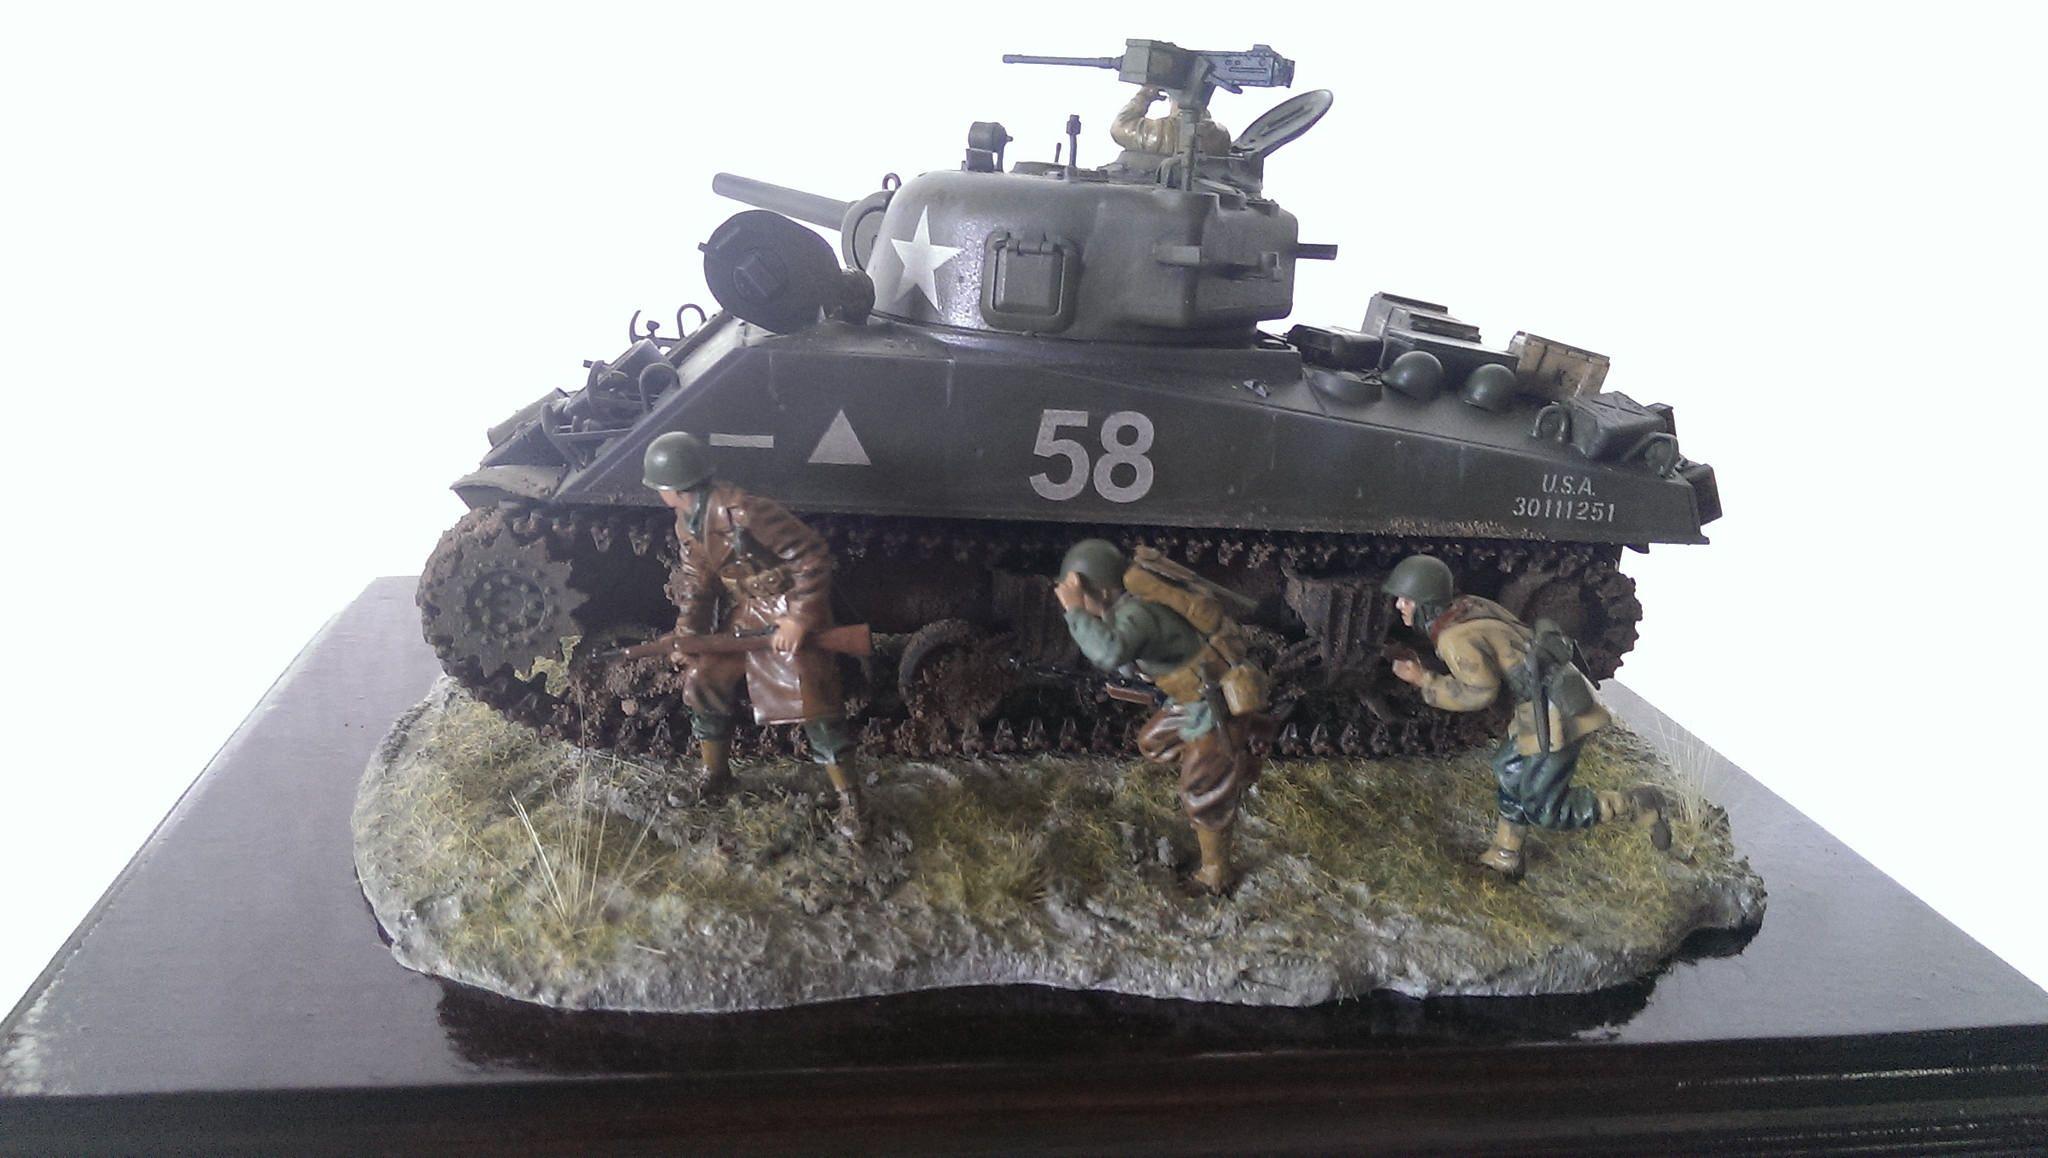 The Tamiya M4A3 Sherman Tank Kit | Building painting model